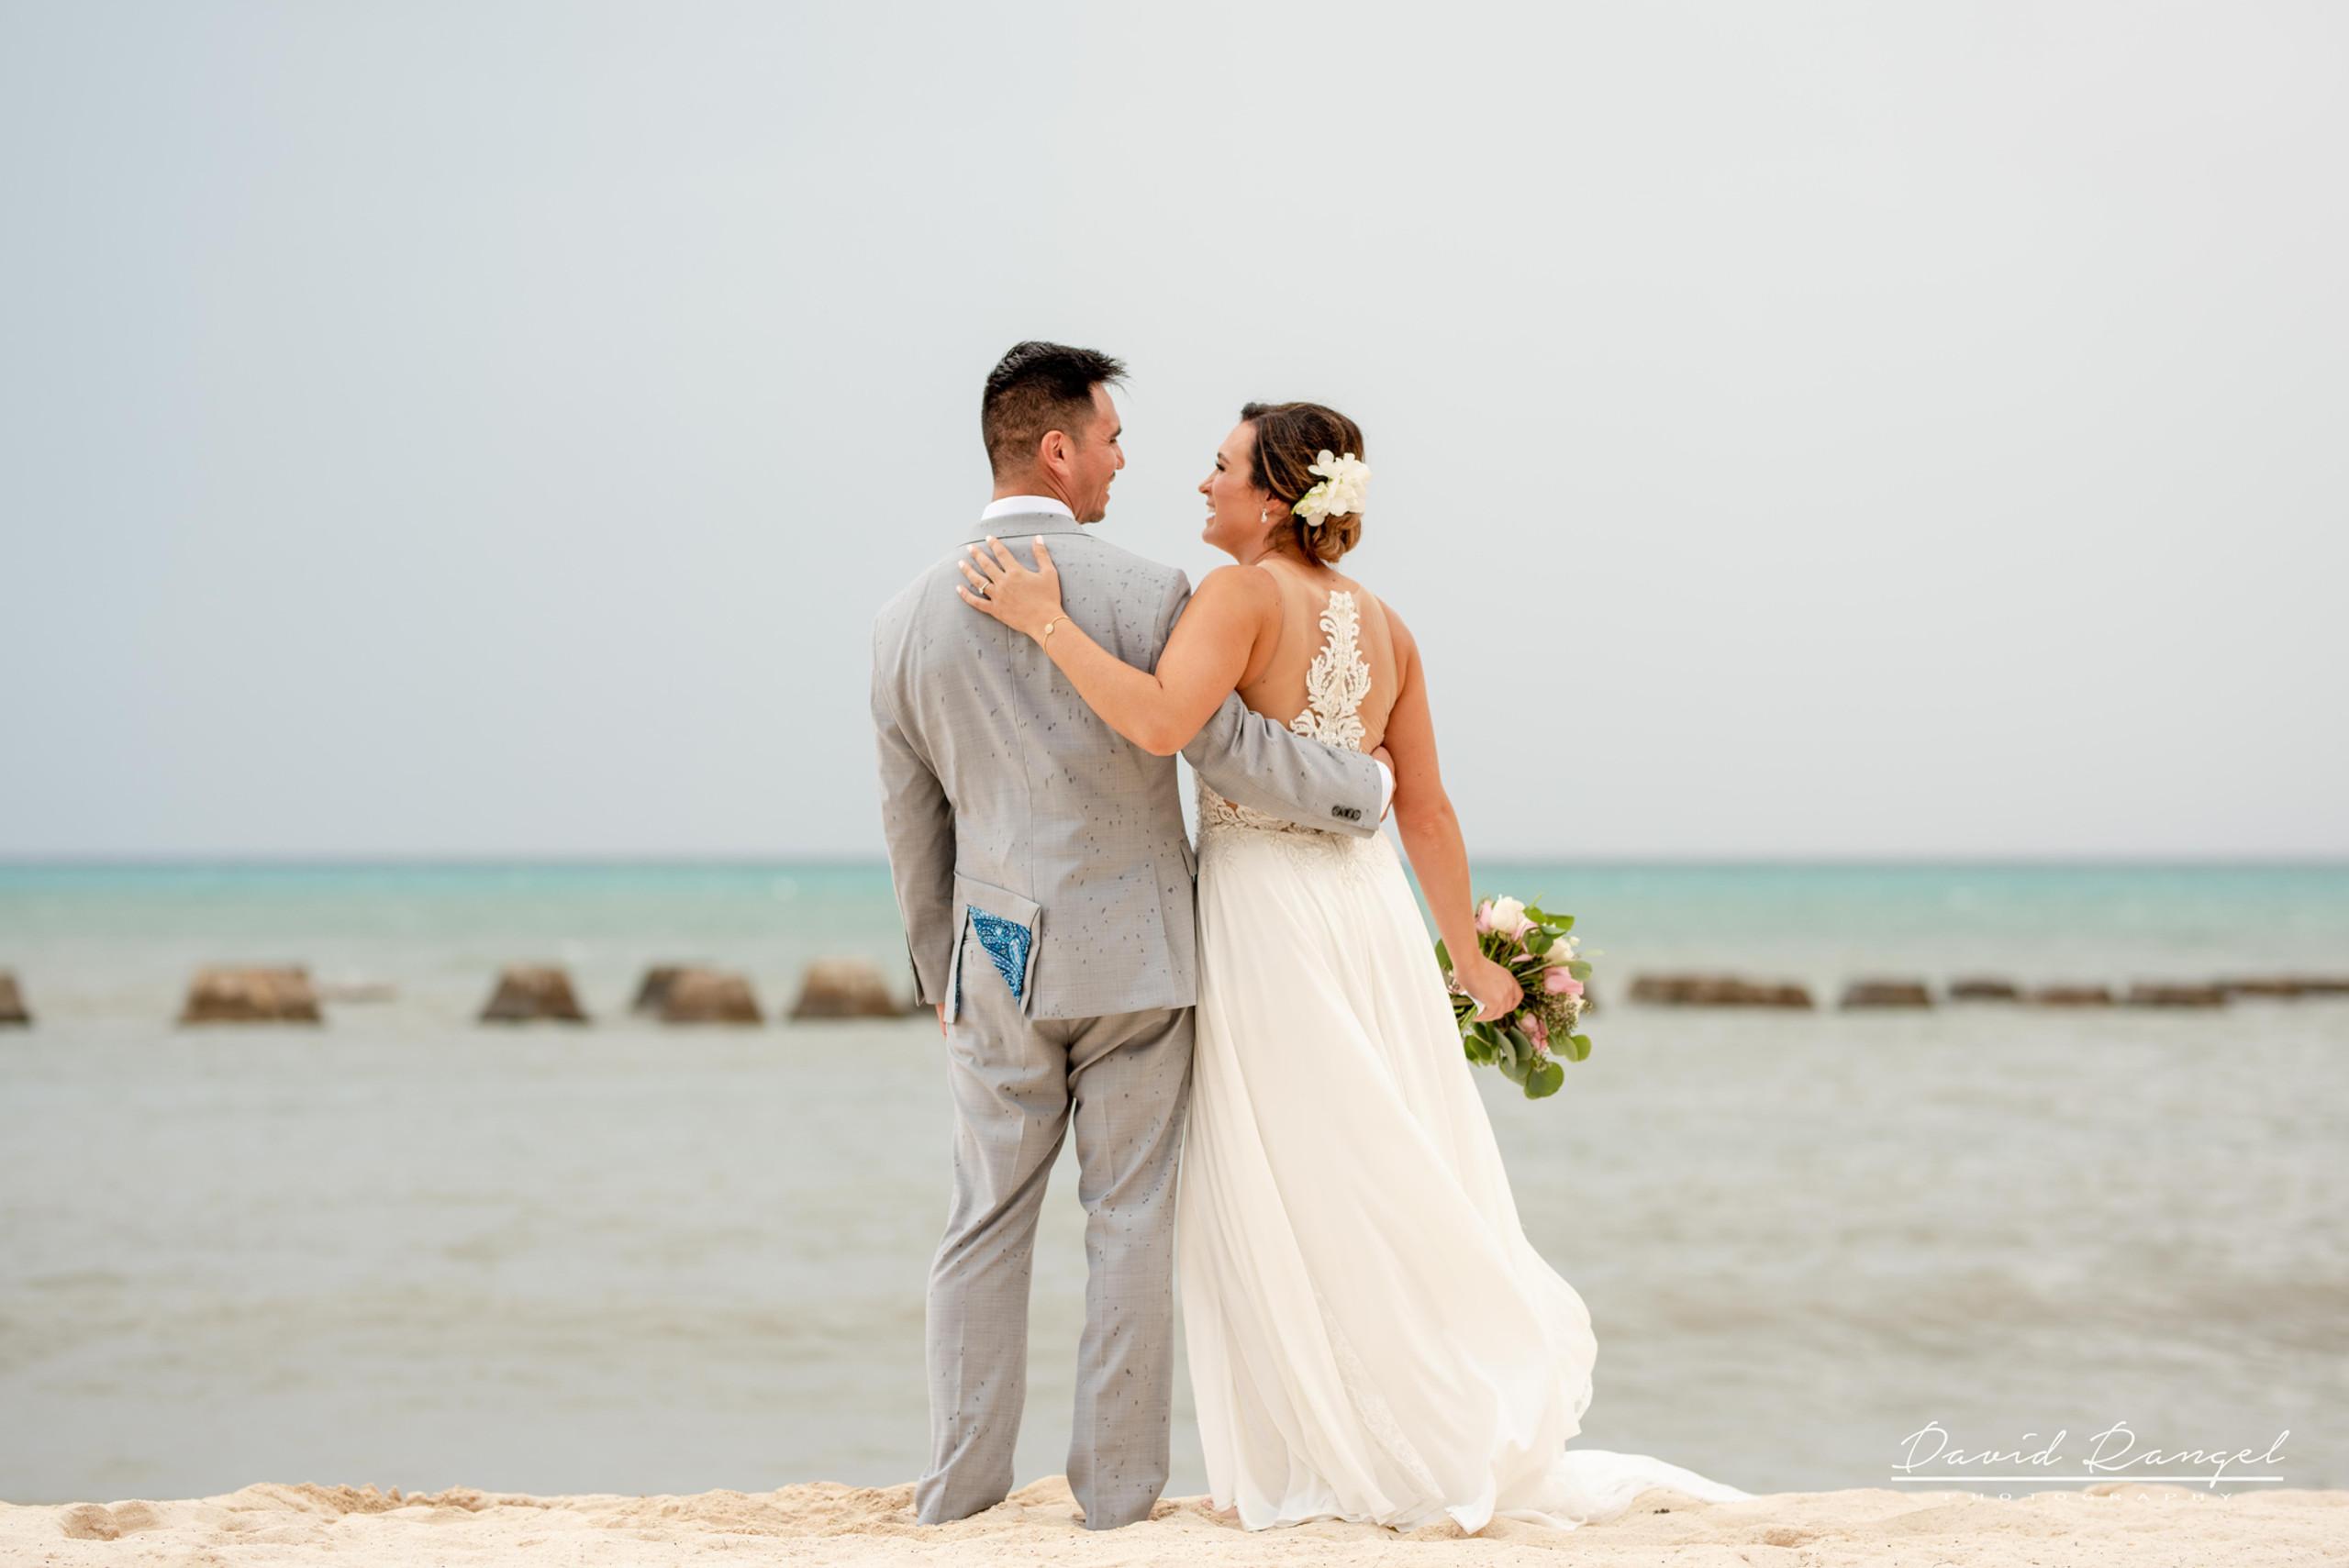 Beach+photo+session+couple+love+hugh+bride+groom